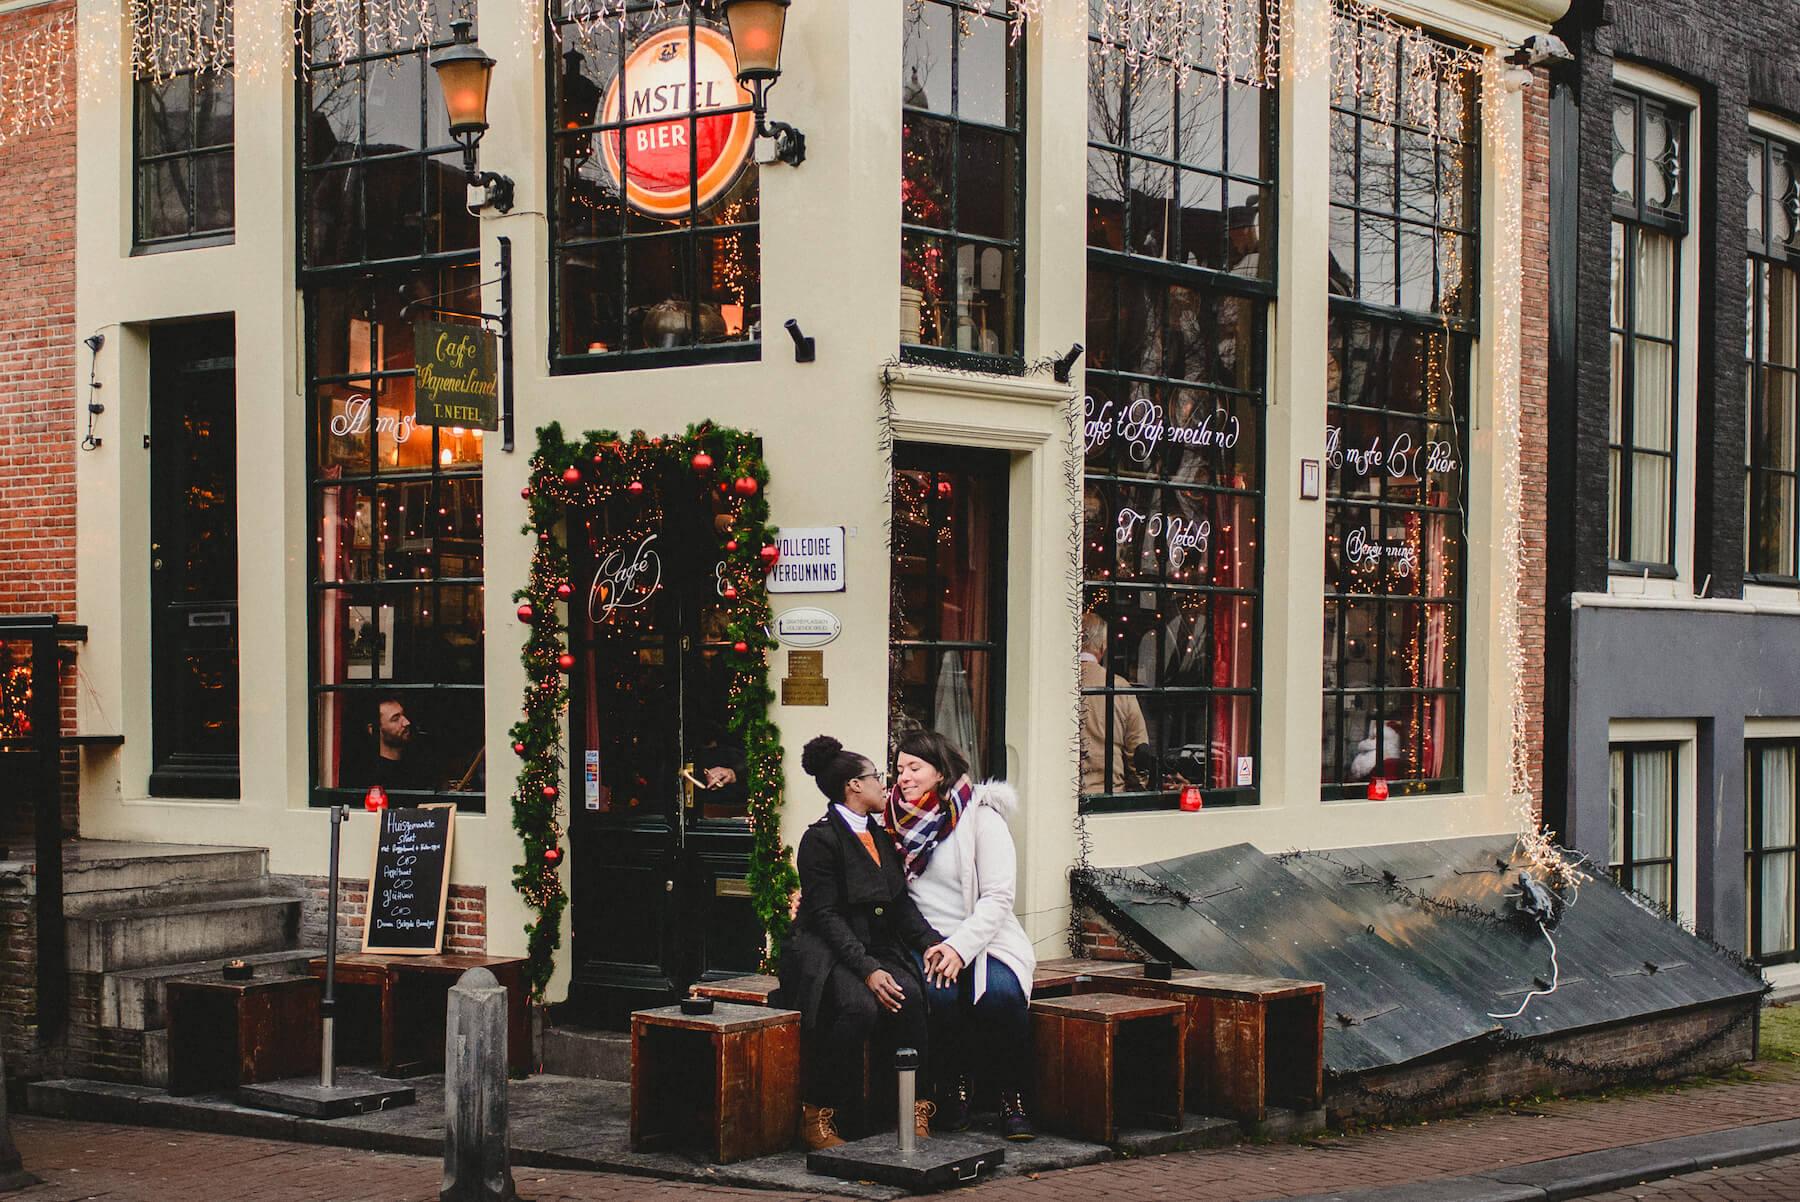 amsterdam-12-26-2019-couples-trip-12_original